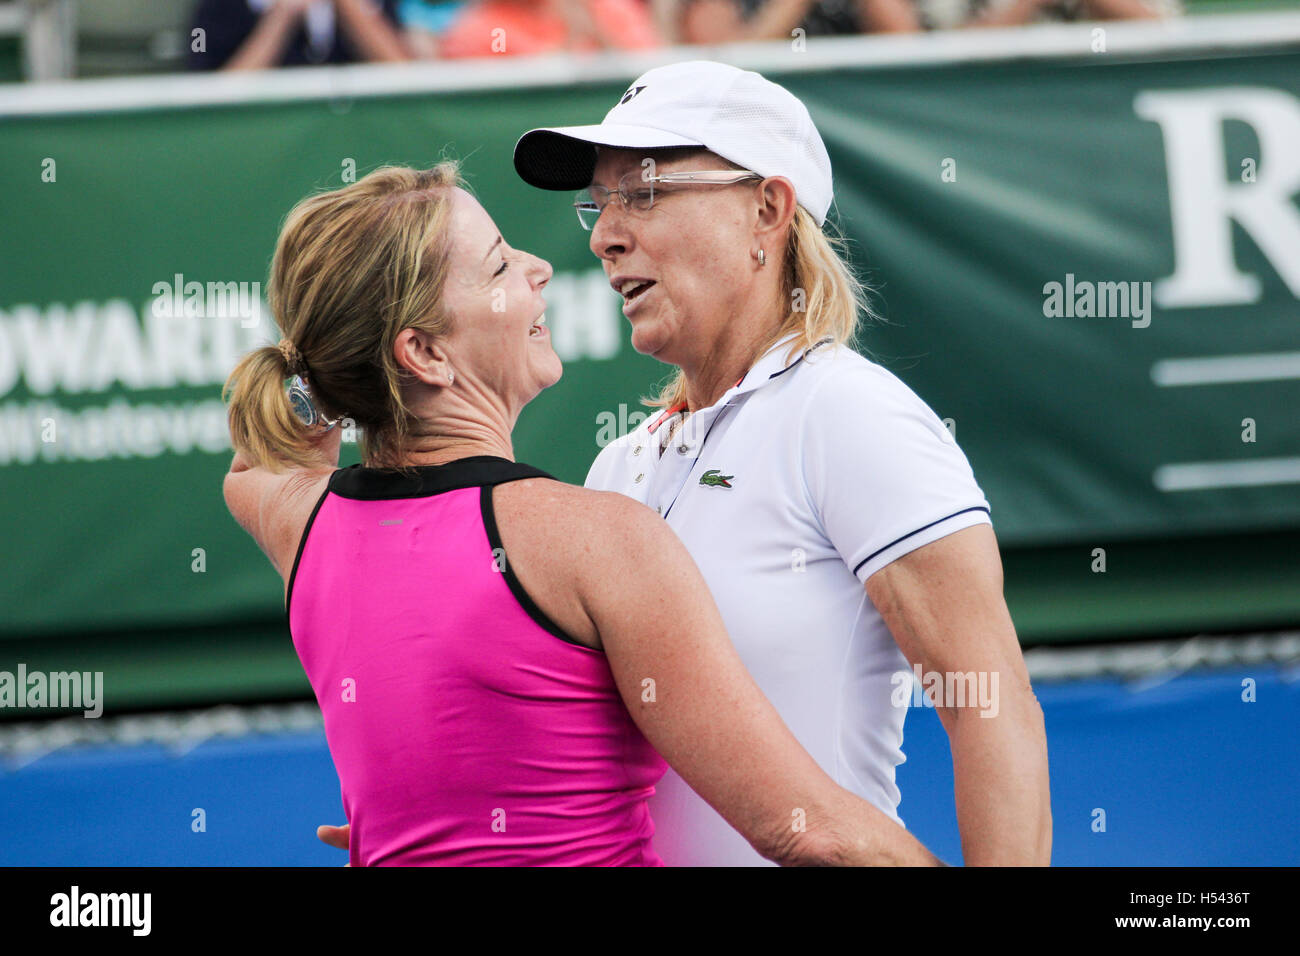 Chris Evert and Martina Navratilova were fierce rivals who have